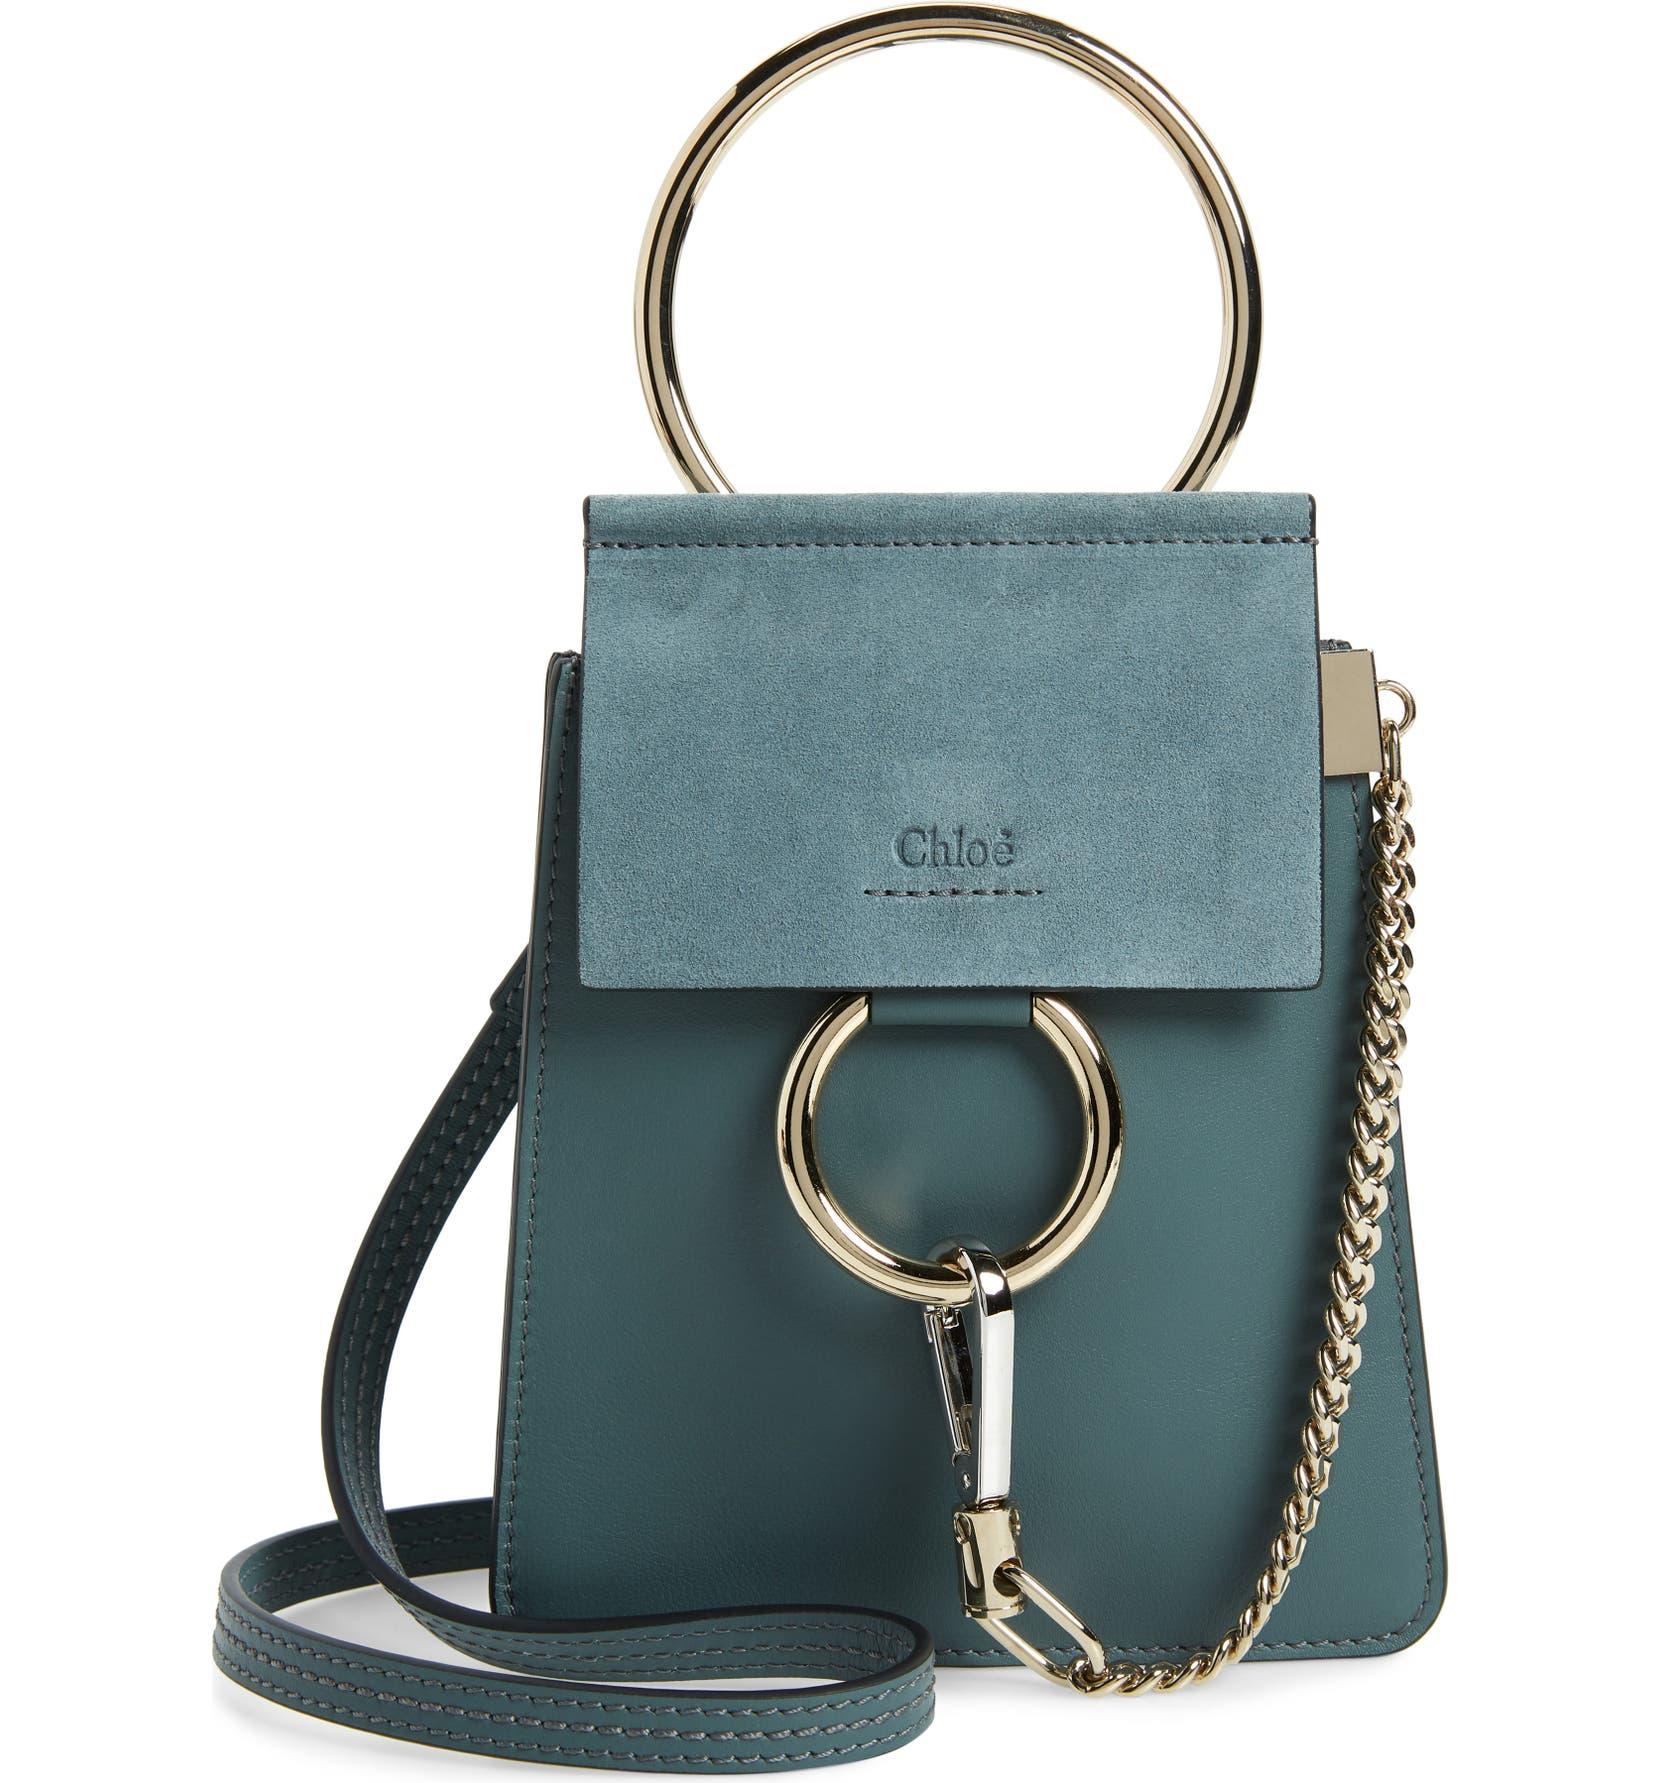 efdb24a8da565 Chloé Faye Small Suede & Leather Bracelet Bag | Nordstrom